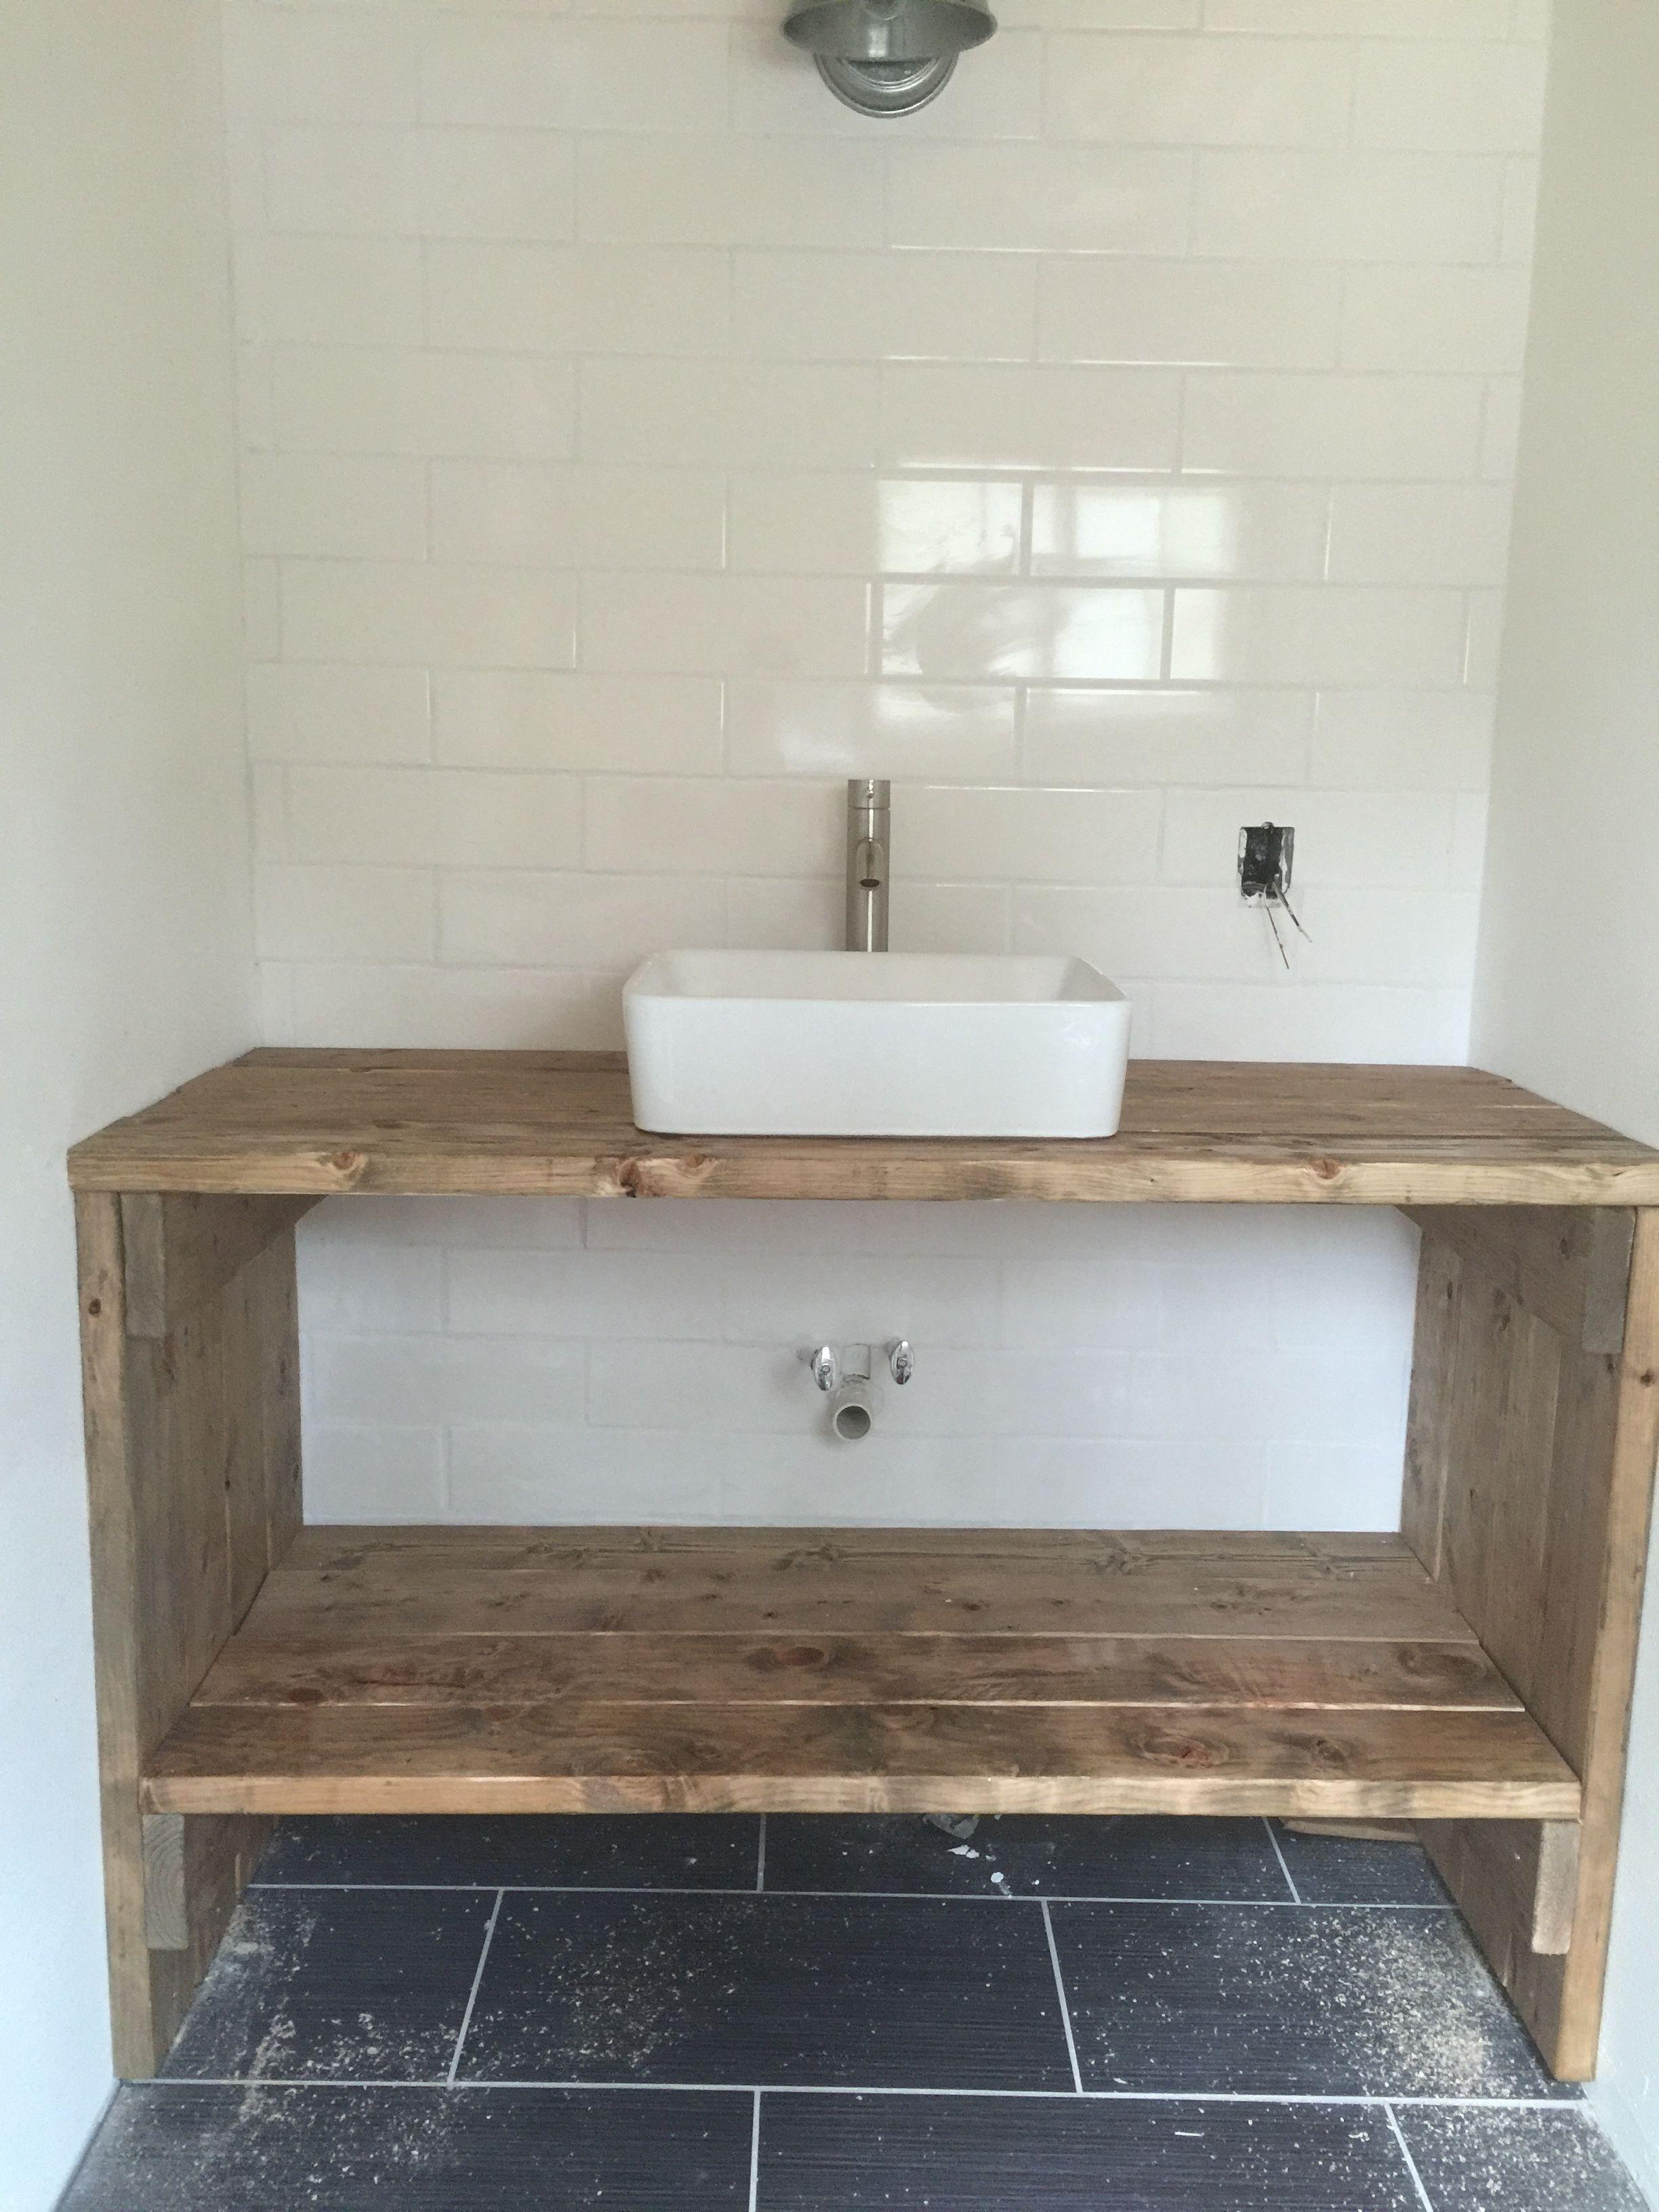 Homemade Vanity From 2x6 Boards In 2019 Diy Bathroom